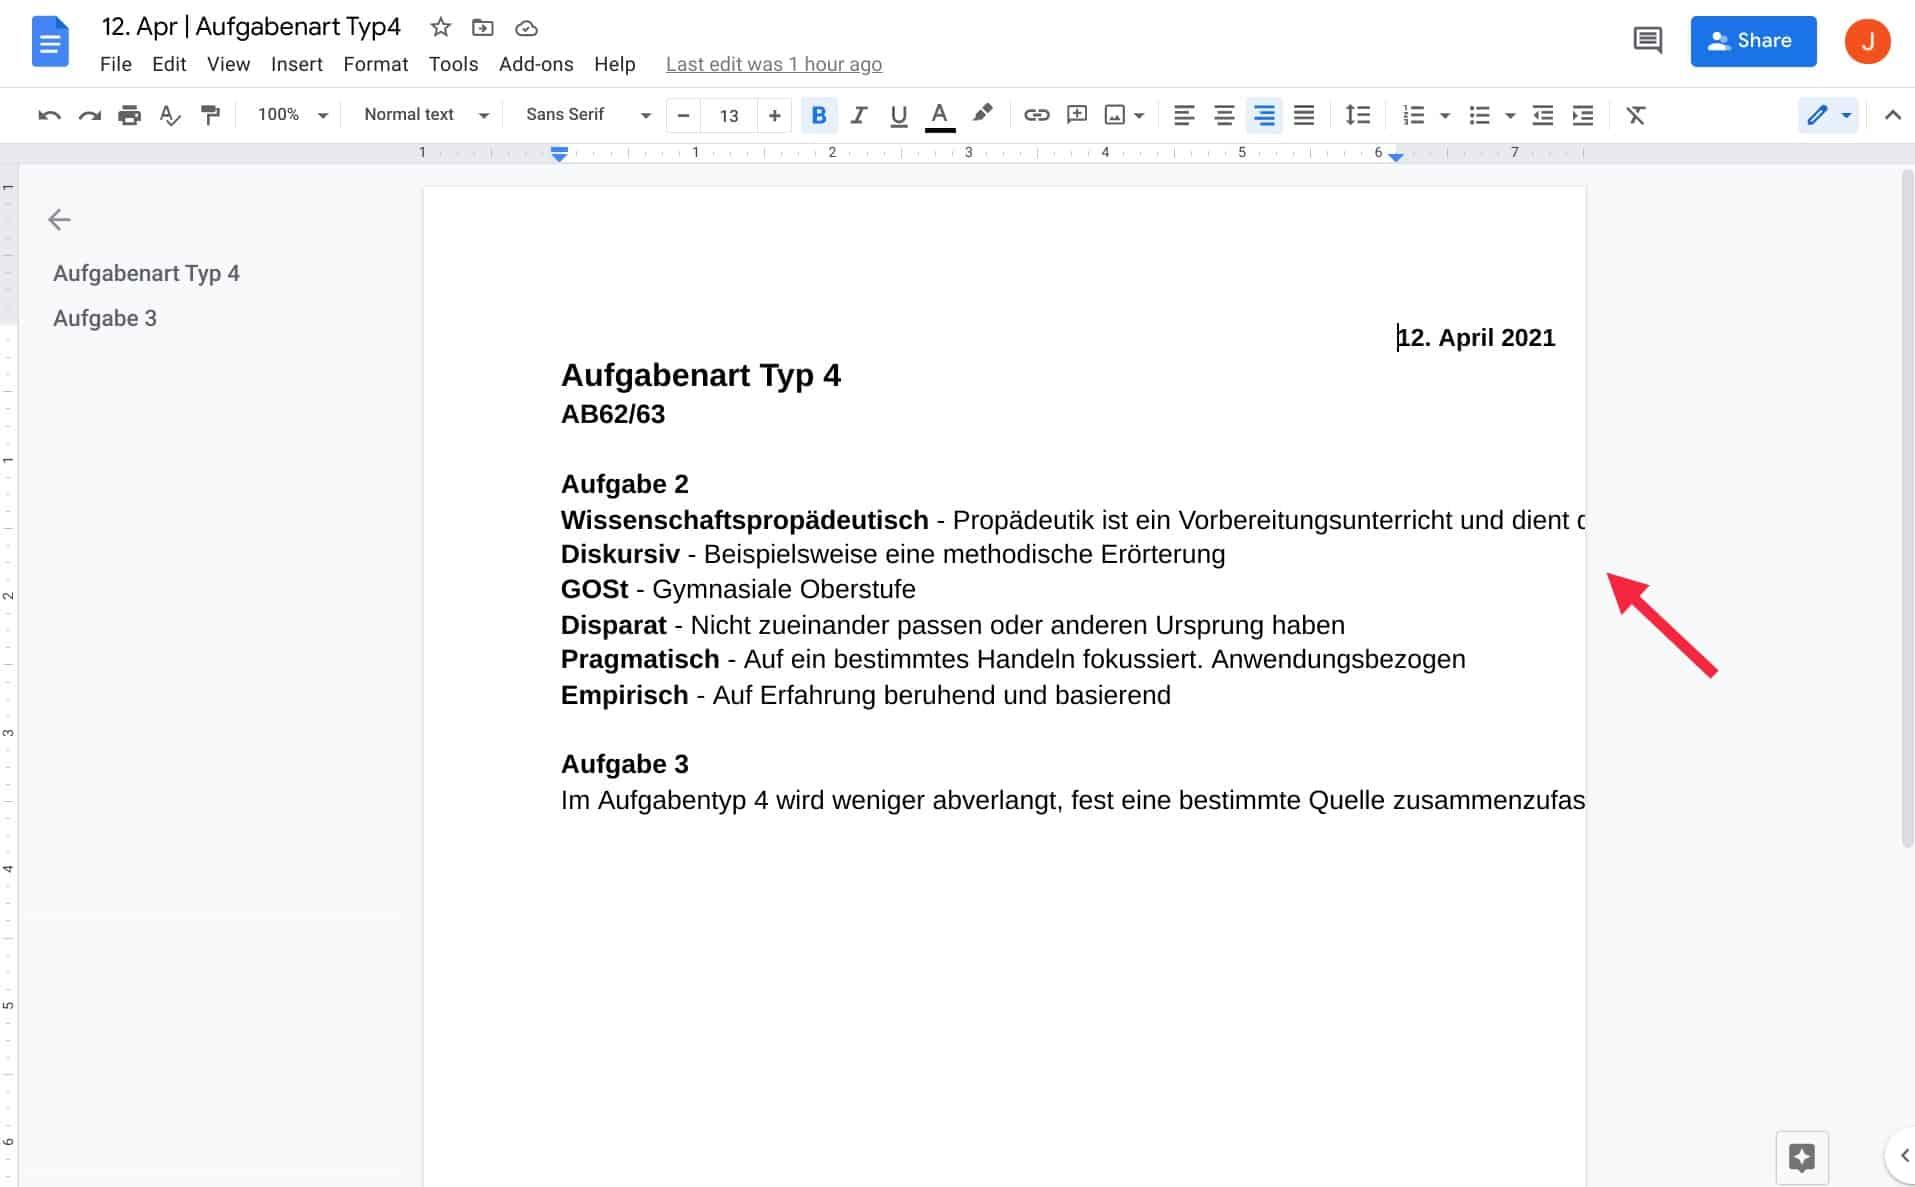 Google Docs Slides Adbocker, number 1